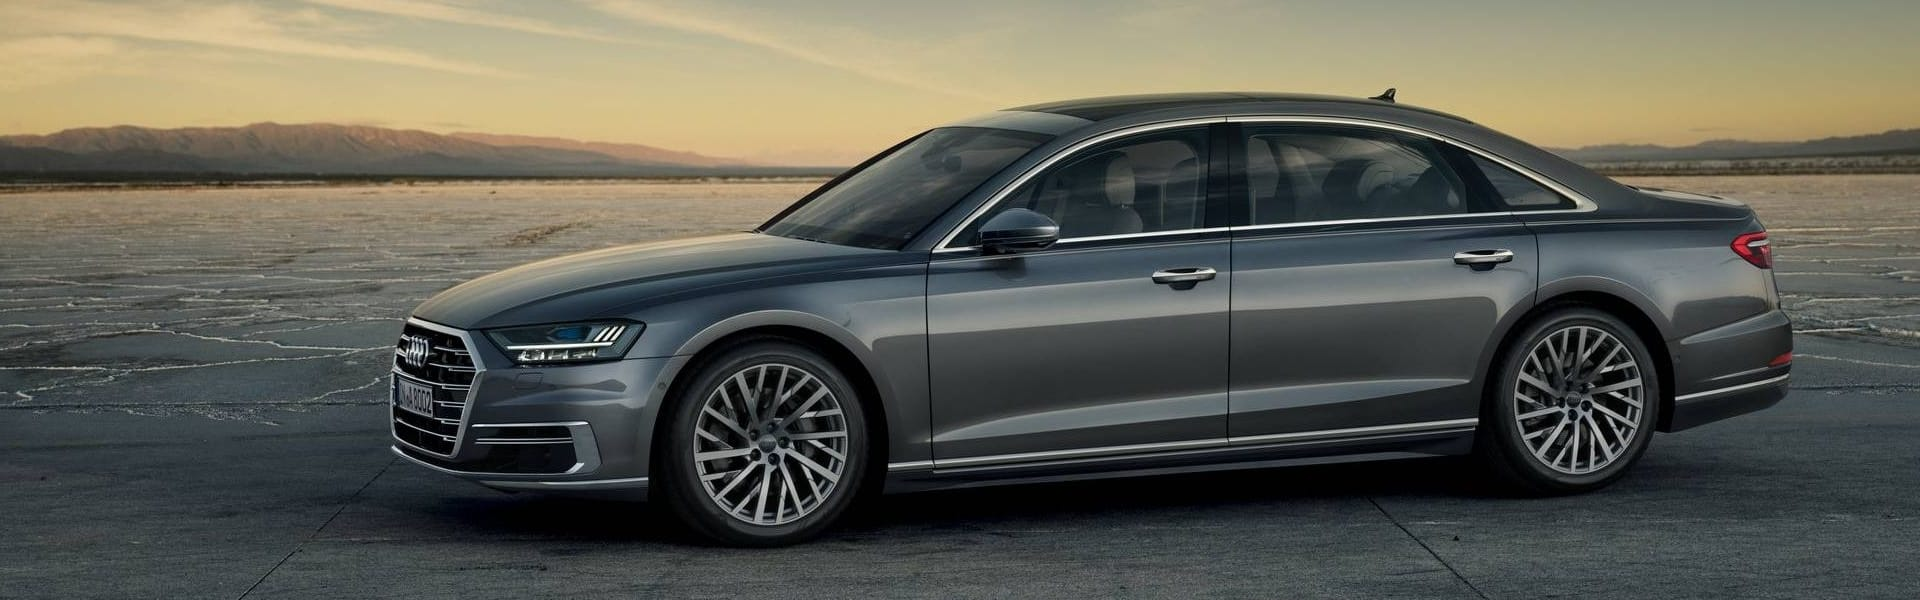 Audi Hong Kong - Audi online payment